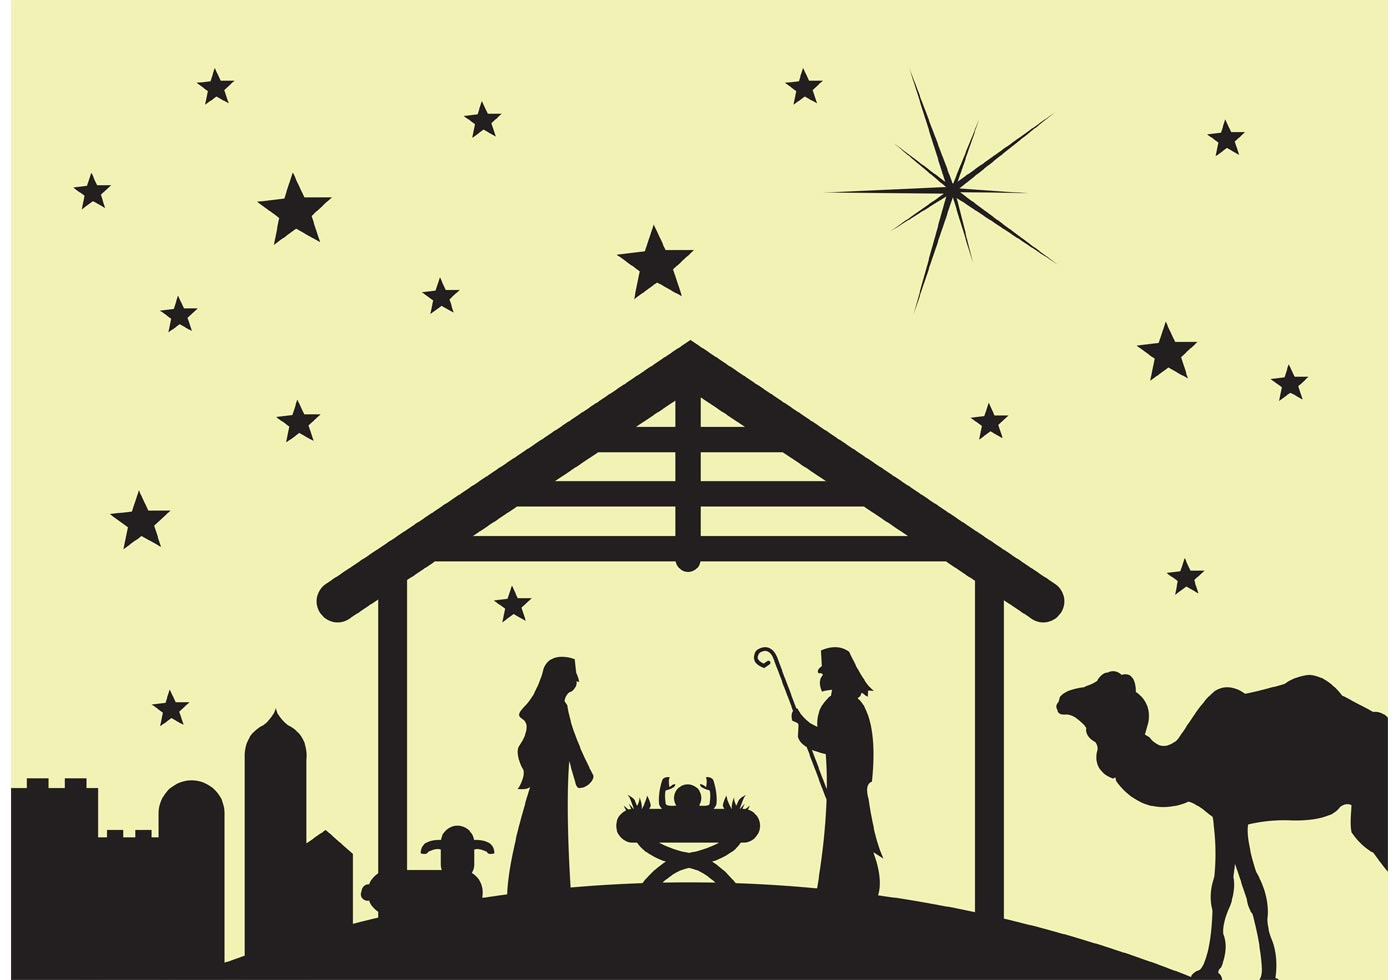 nativity vector wallpaper in - photo #12